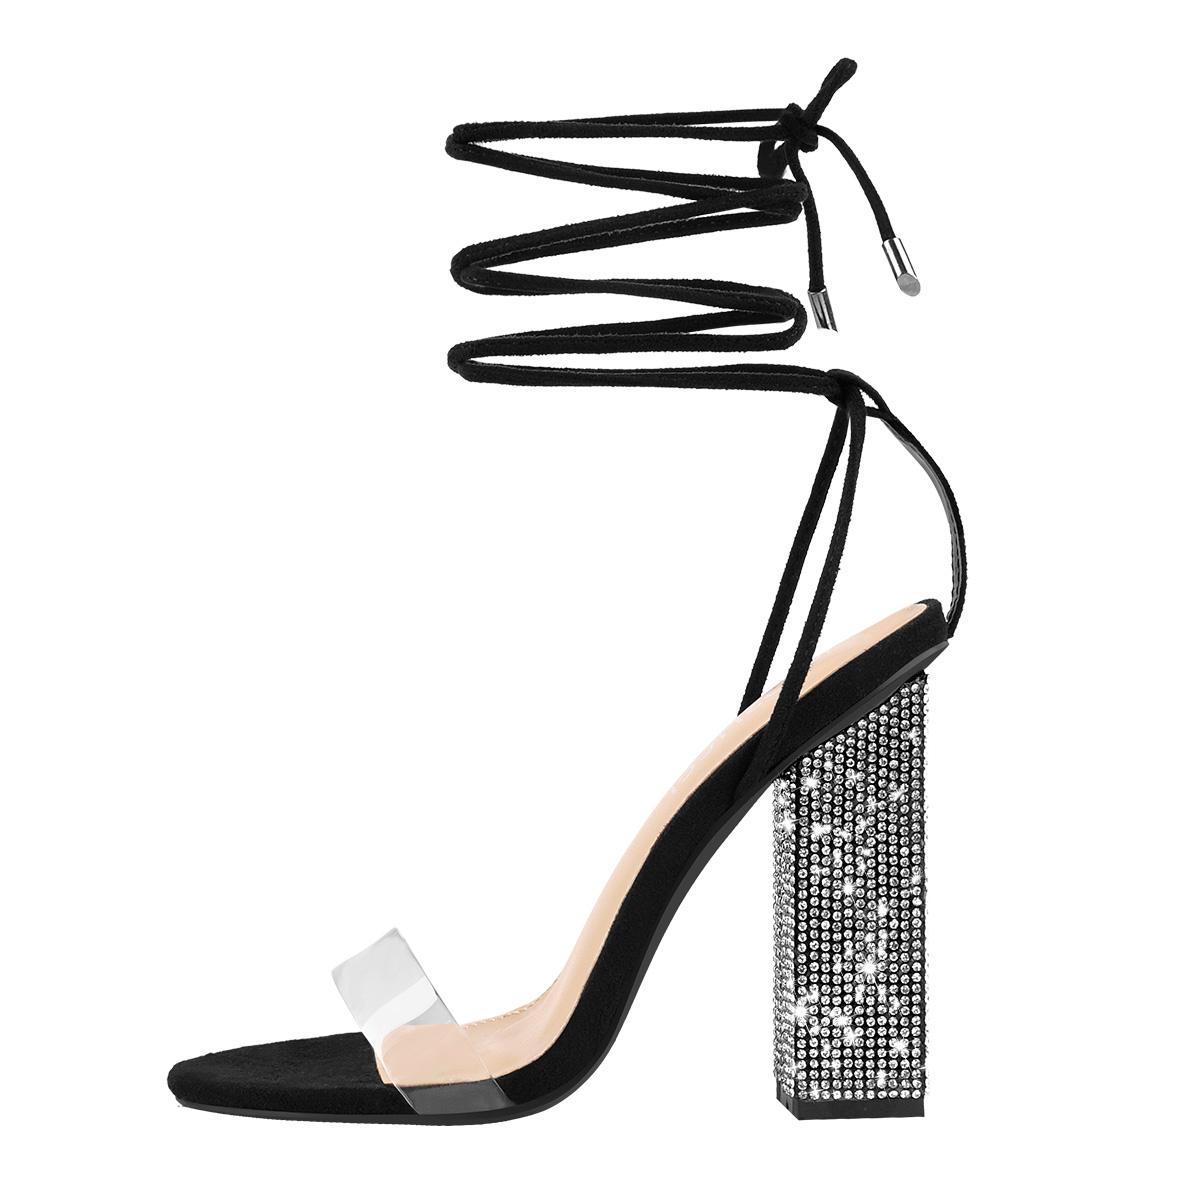 MissHeel Rhinestone Chunky Heel Sandals Lace Up